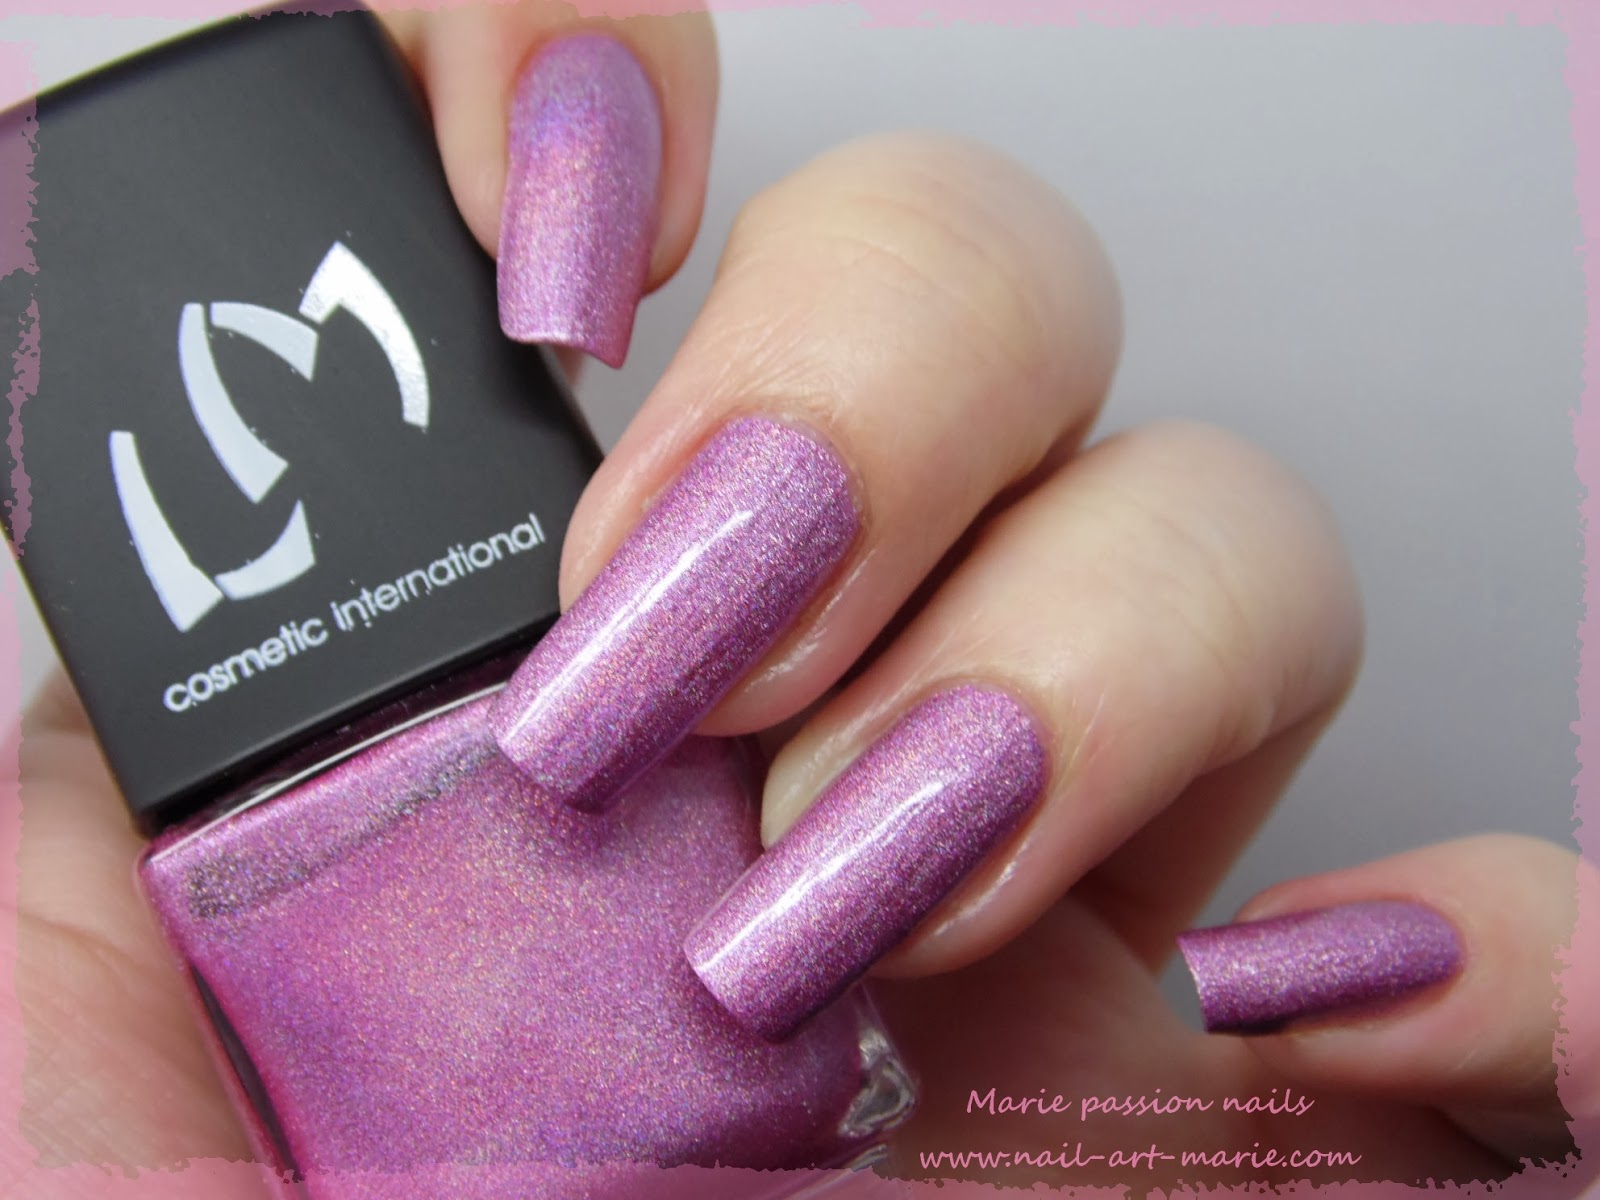 LM Cosmetic Izar8